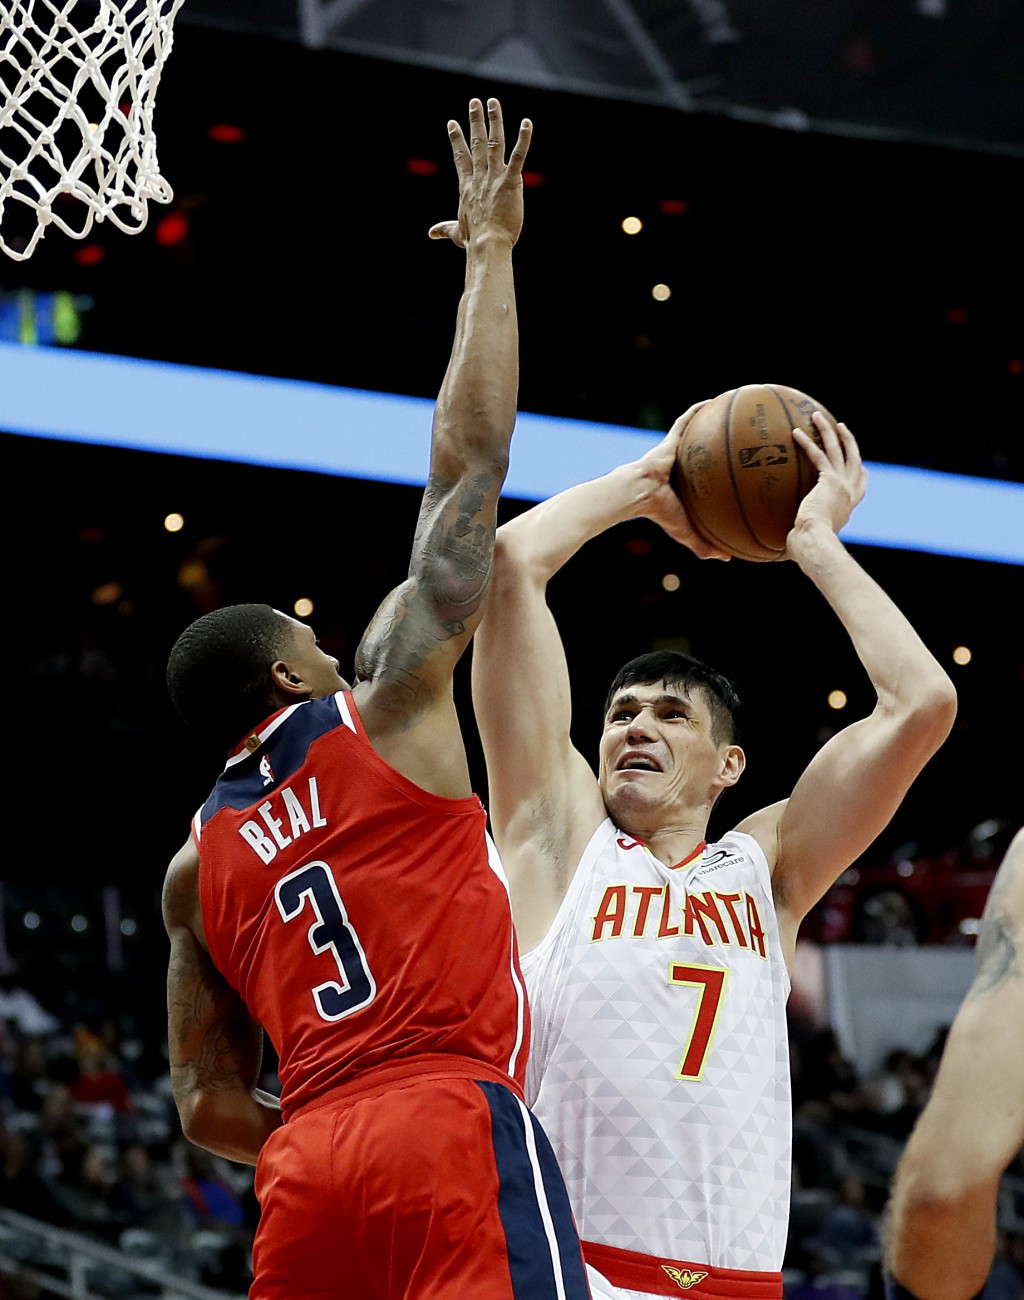 Atlanta Hawks' Ersan Ilyasova (7), of Turkey, shoots against Washington Wizards' Bradley Beal in the second quarter of an NBA basketball game in Atlan...